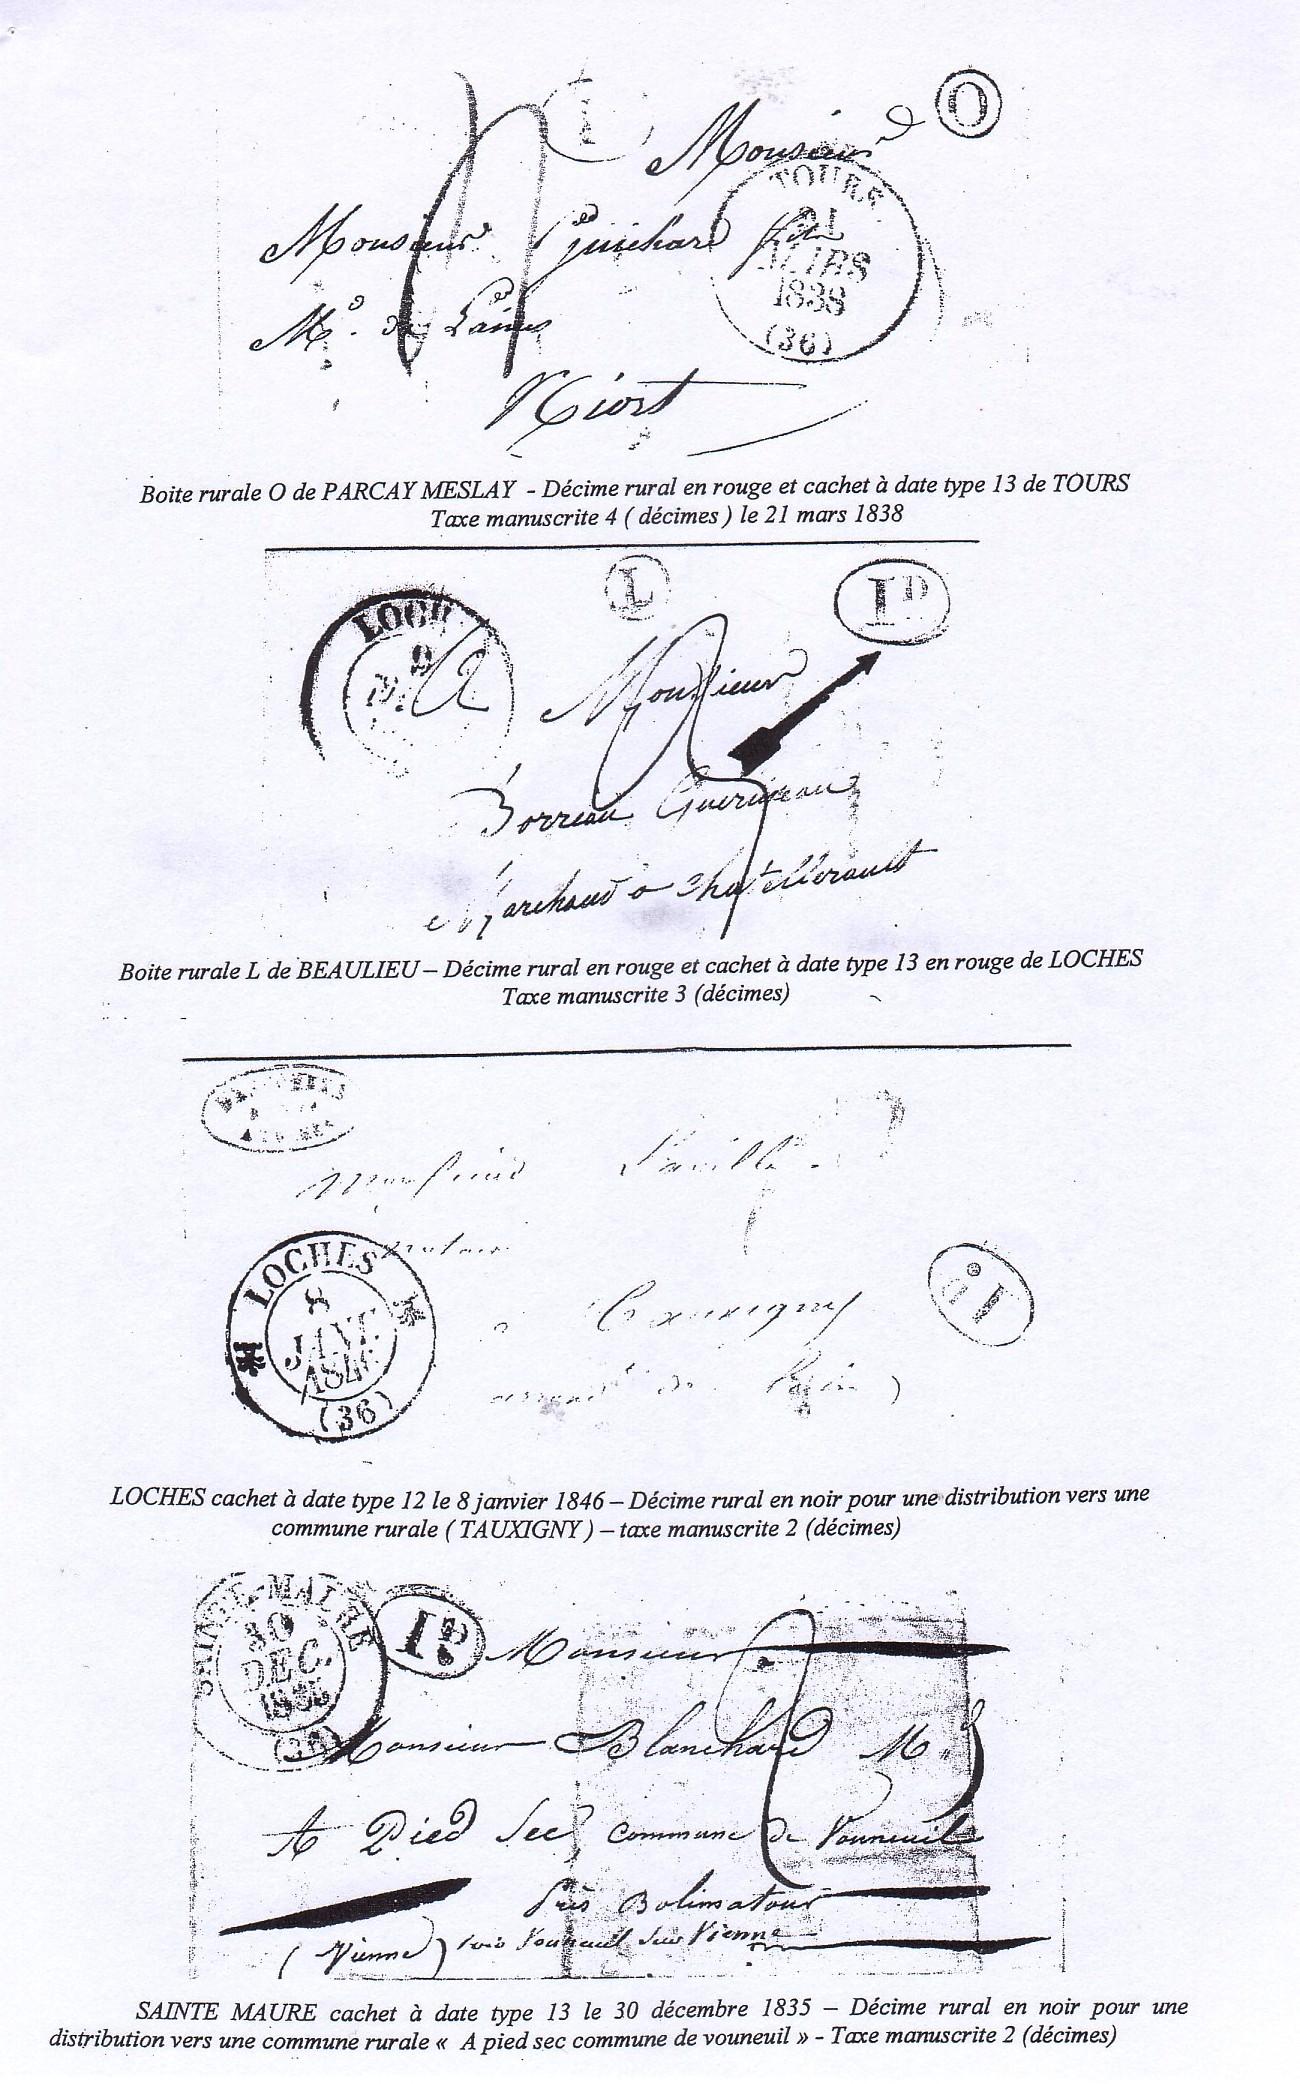 Le_service_postal_rural_en_1830-03